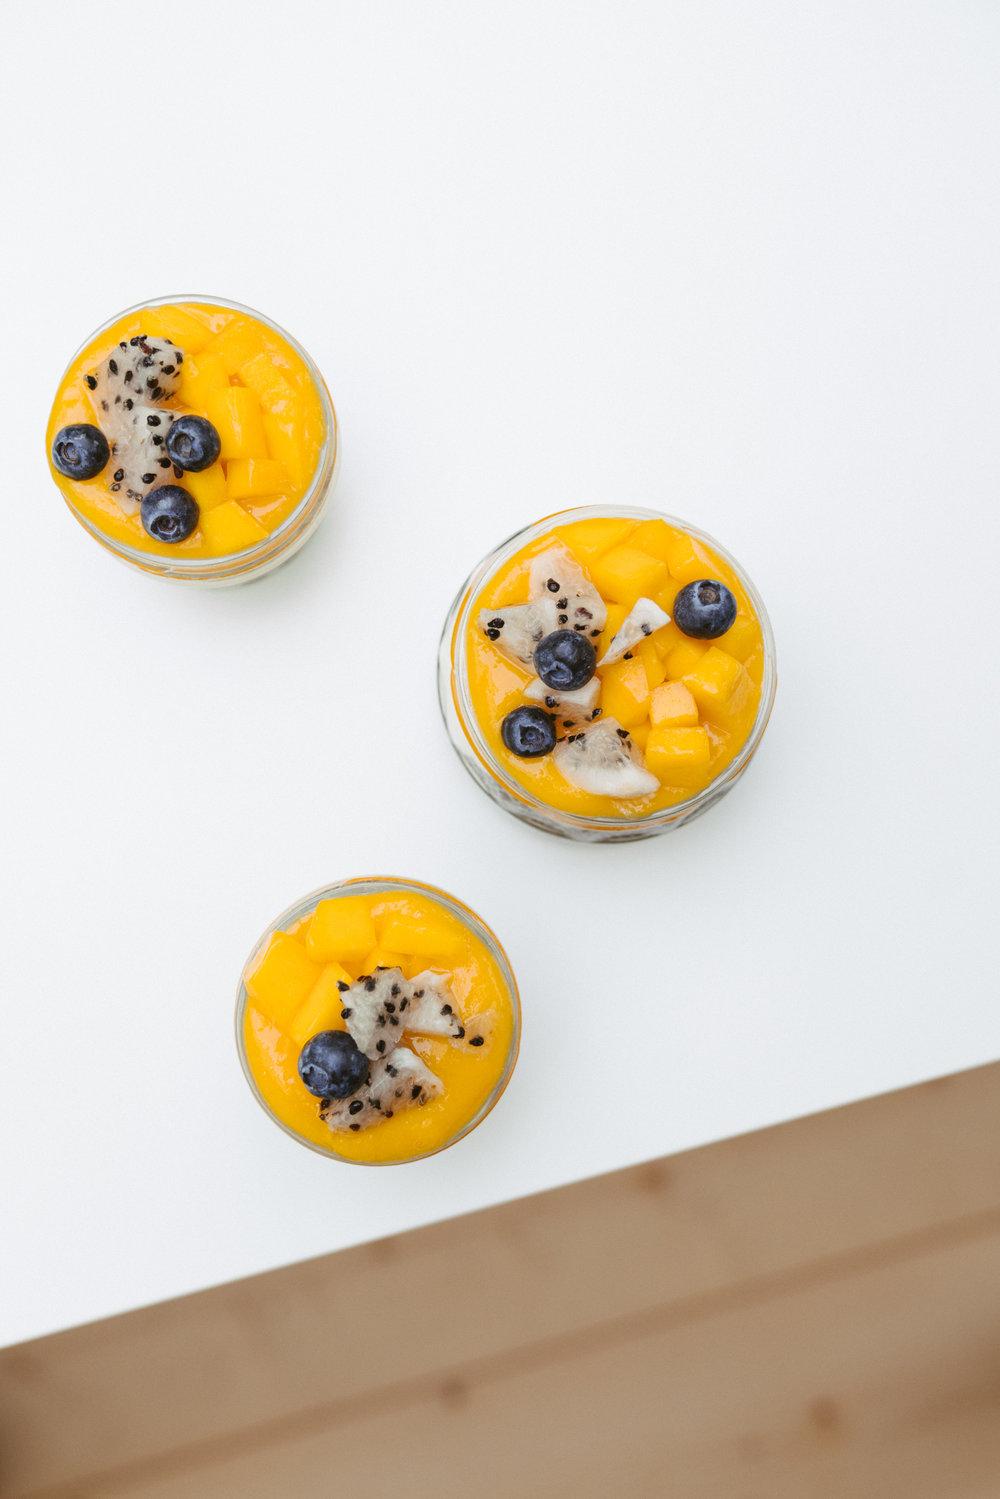 mango_passionfruit_chia_and_yoghurt_jars-7.jpg